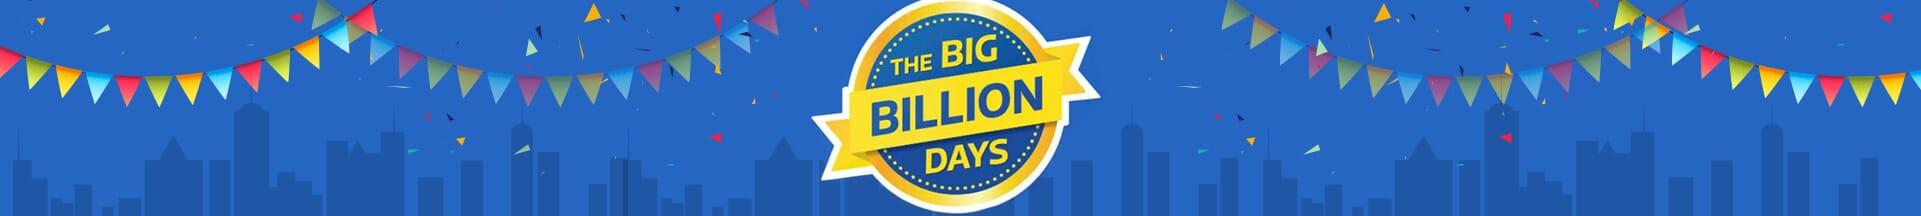 big billion day offers